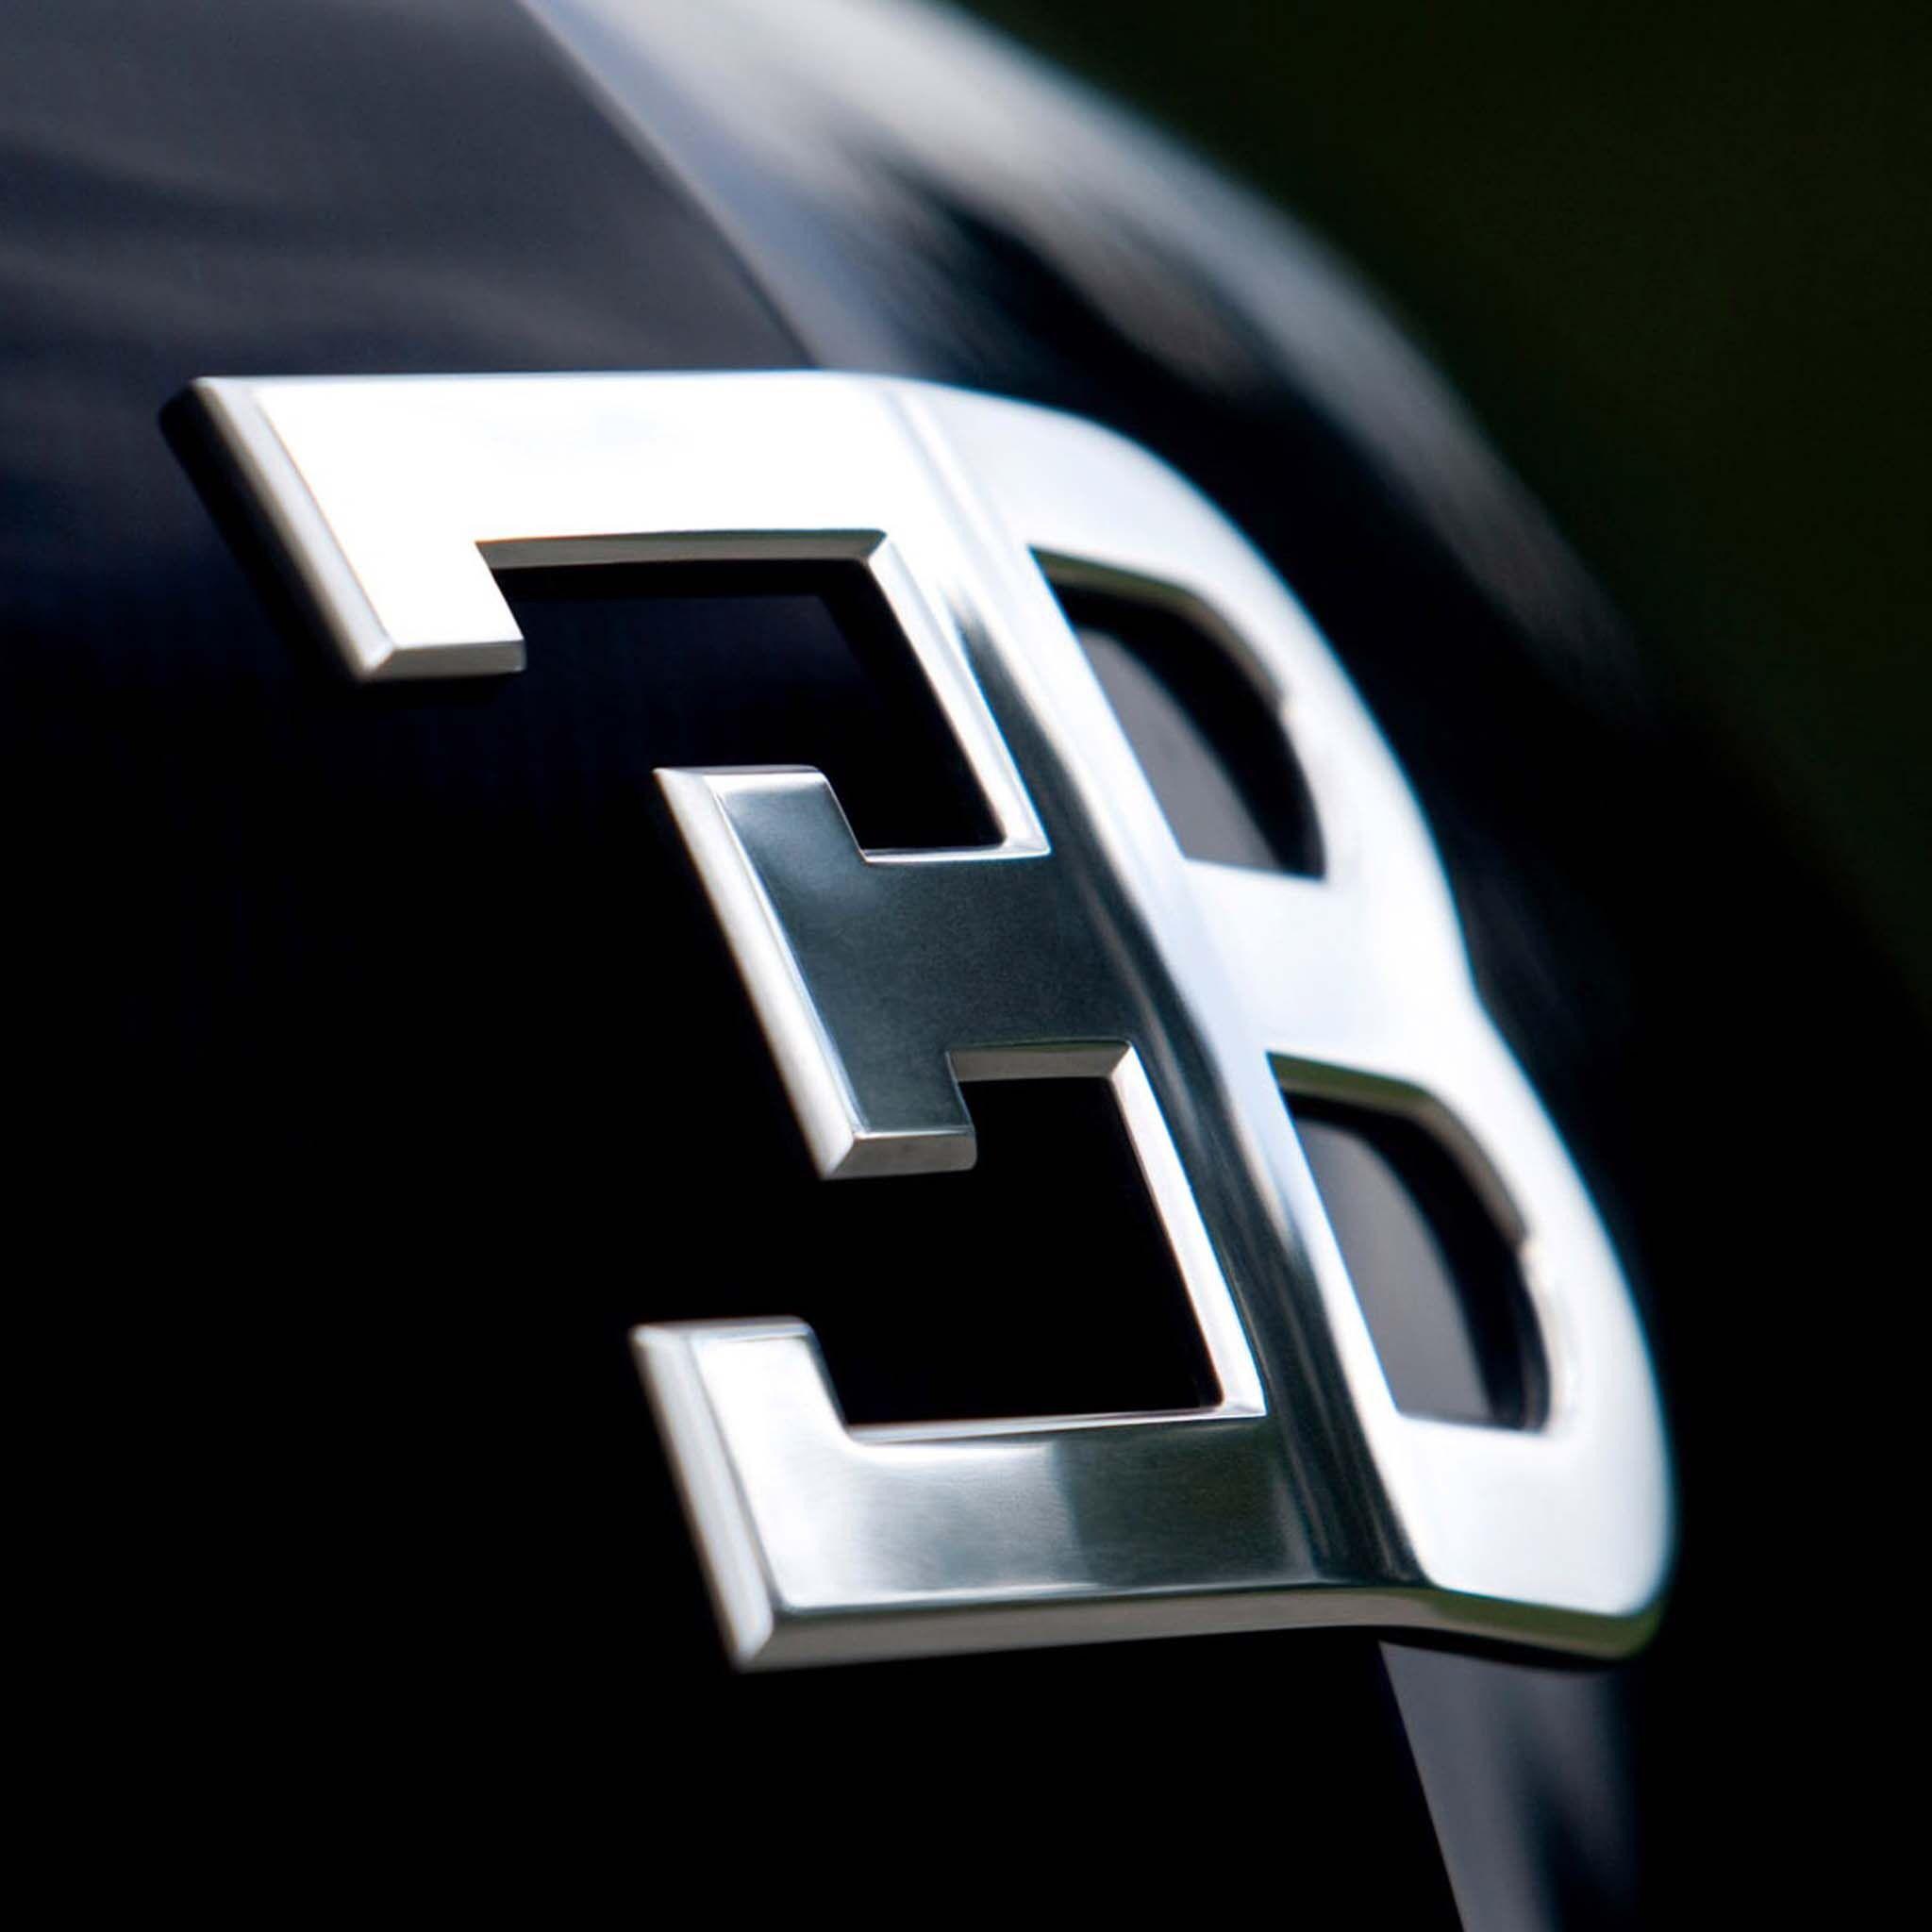 ettore bugatti logo man cave wall pinterest logos cars and